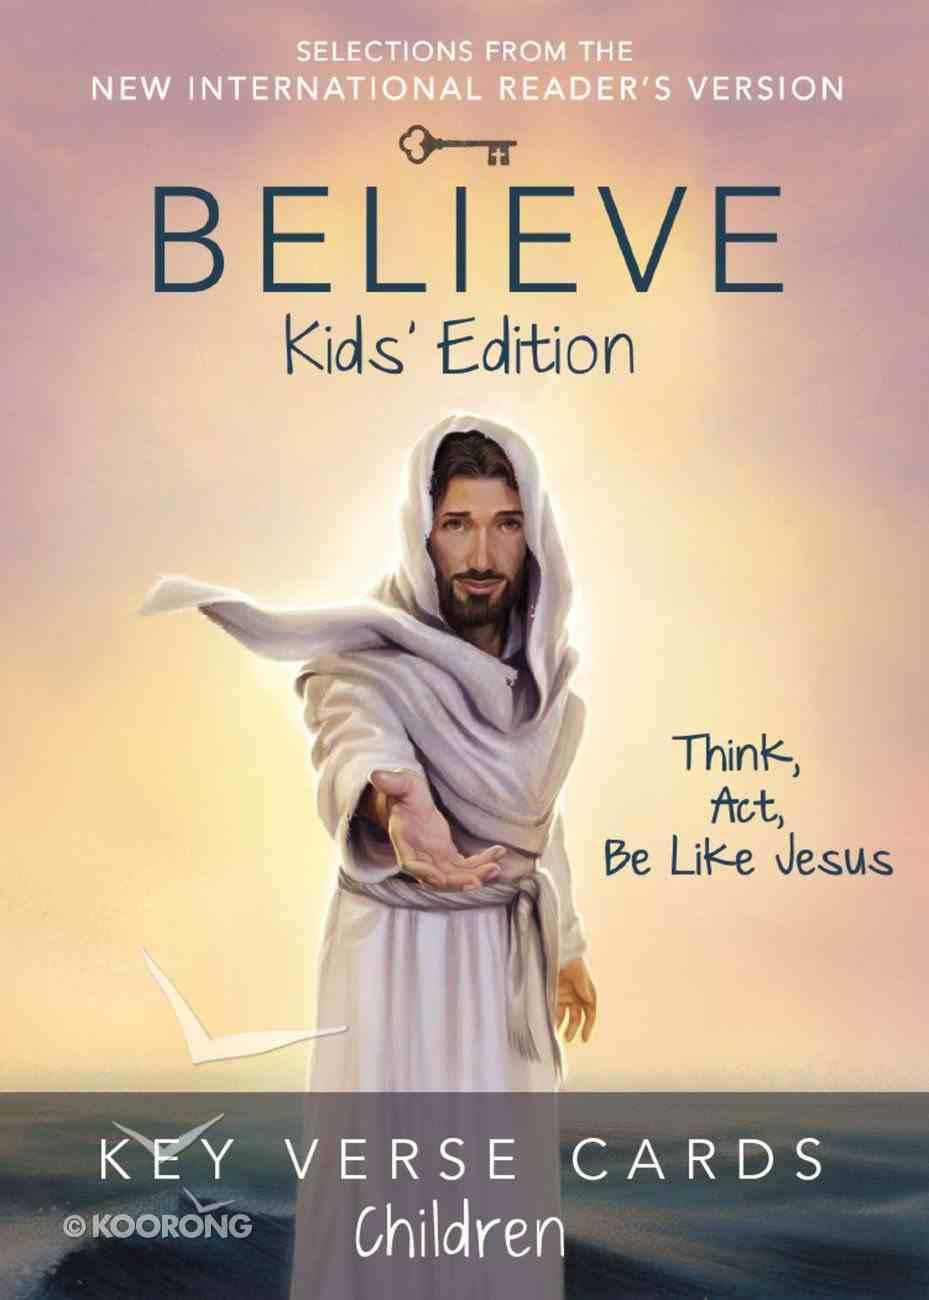 Believe Key Verse Cards: Children Cards